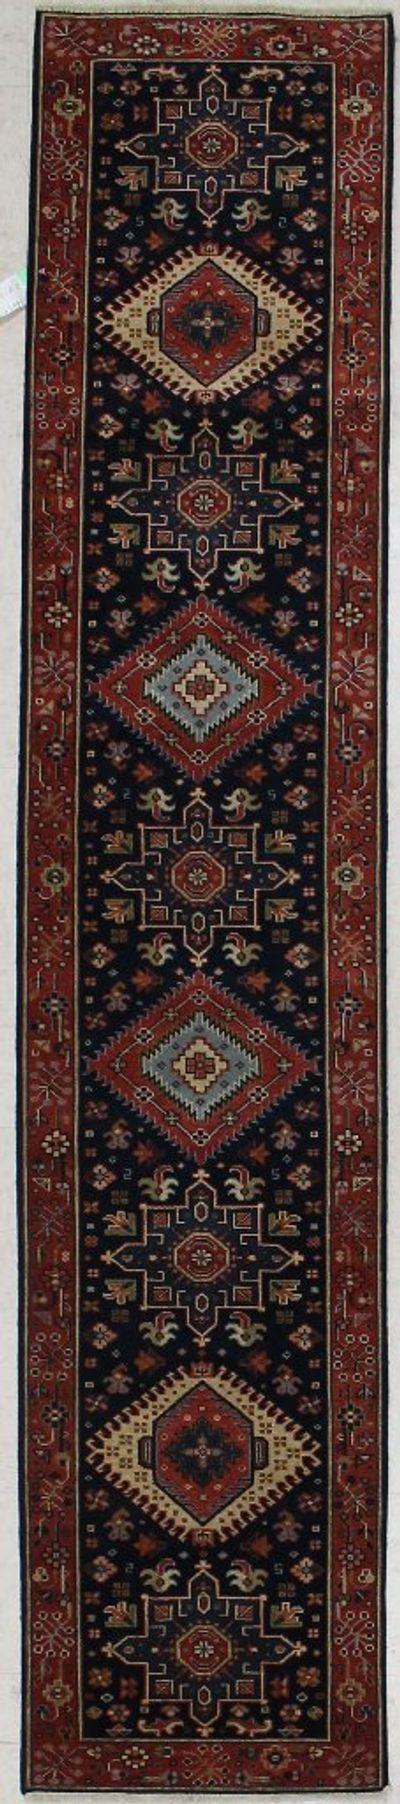 NAVY Serapi Rug #7520 • 2′0″ x 10′0″ • Wool on Cotton